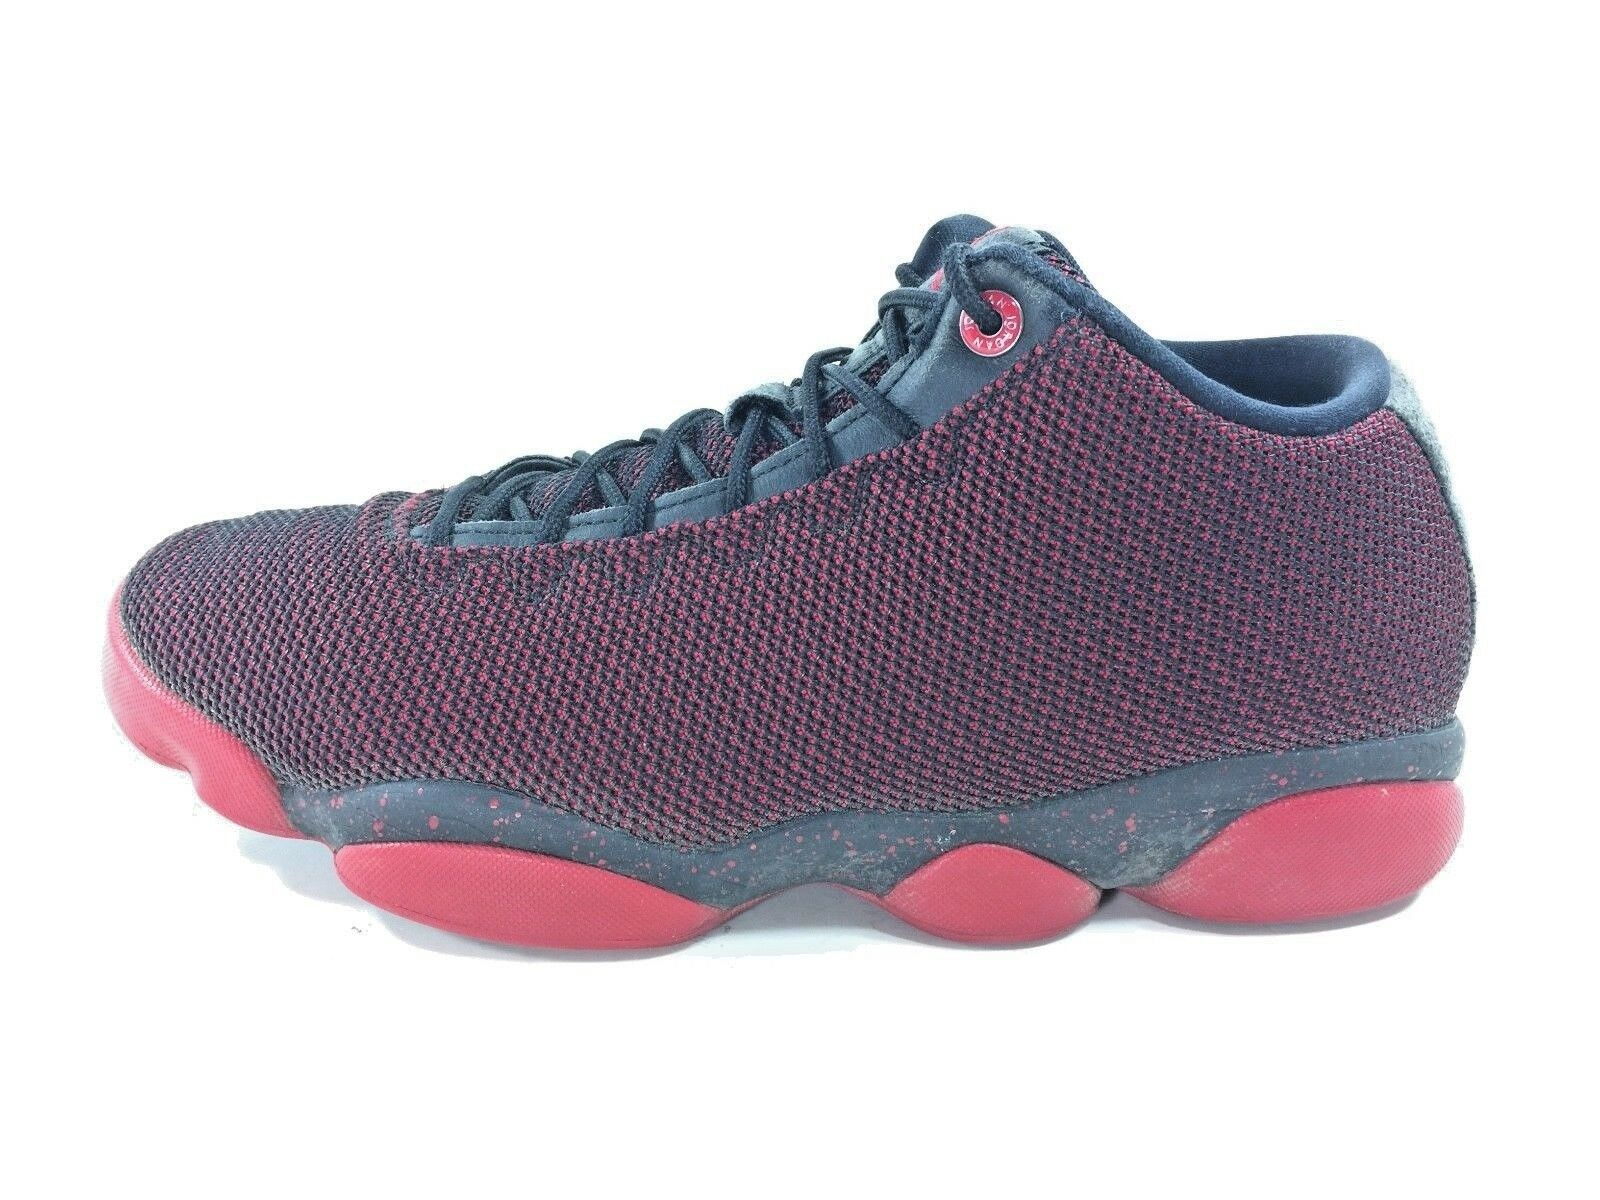 Nike™ ~ AIR JORDAN HORIZON LOW GYM Basketball Shoes ~ 845098-001 ~ Men Sz 10.5